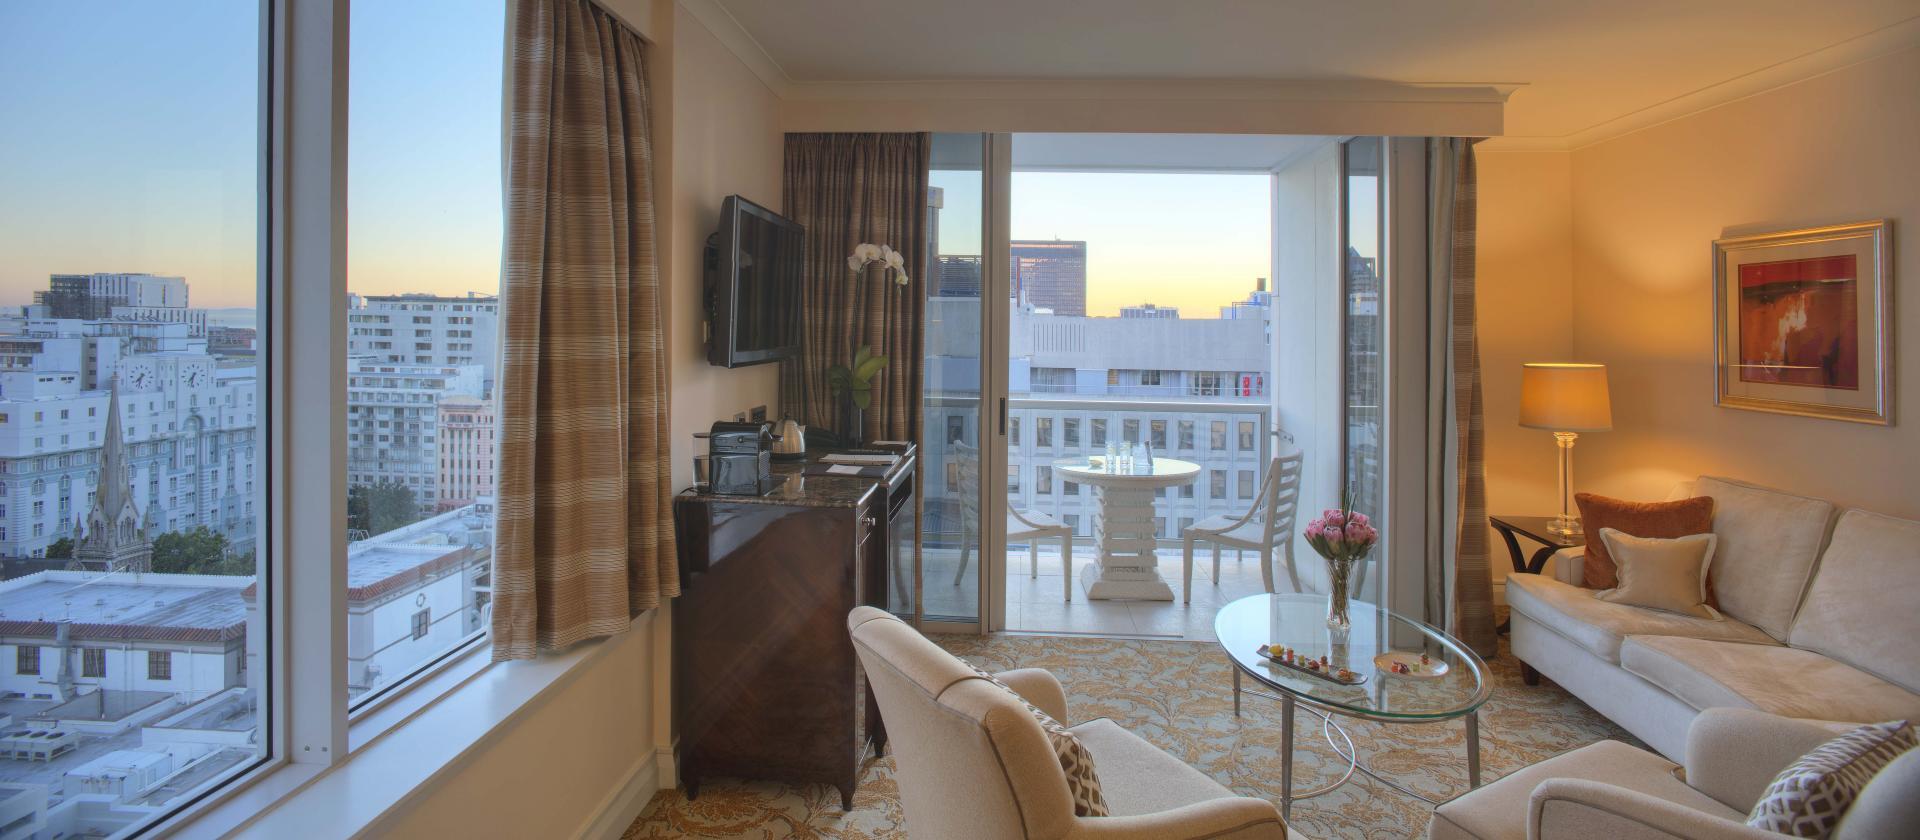 Lounge and Balcony at Taj Cape Town, Centre, Cape Town